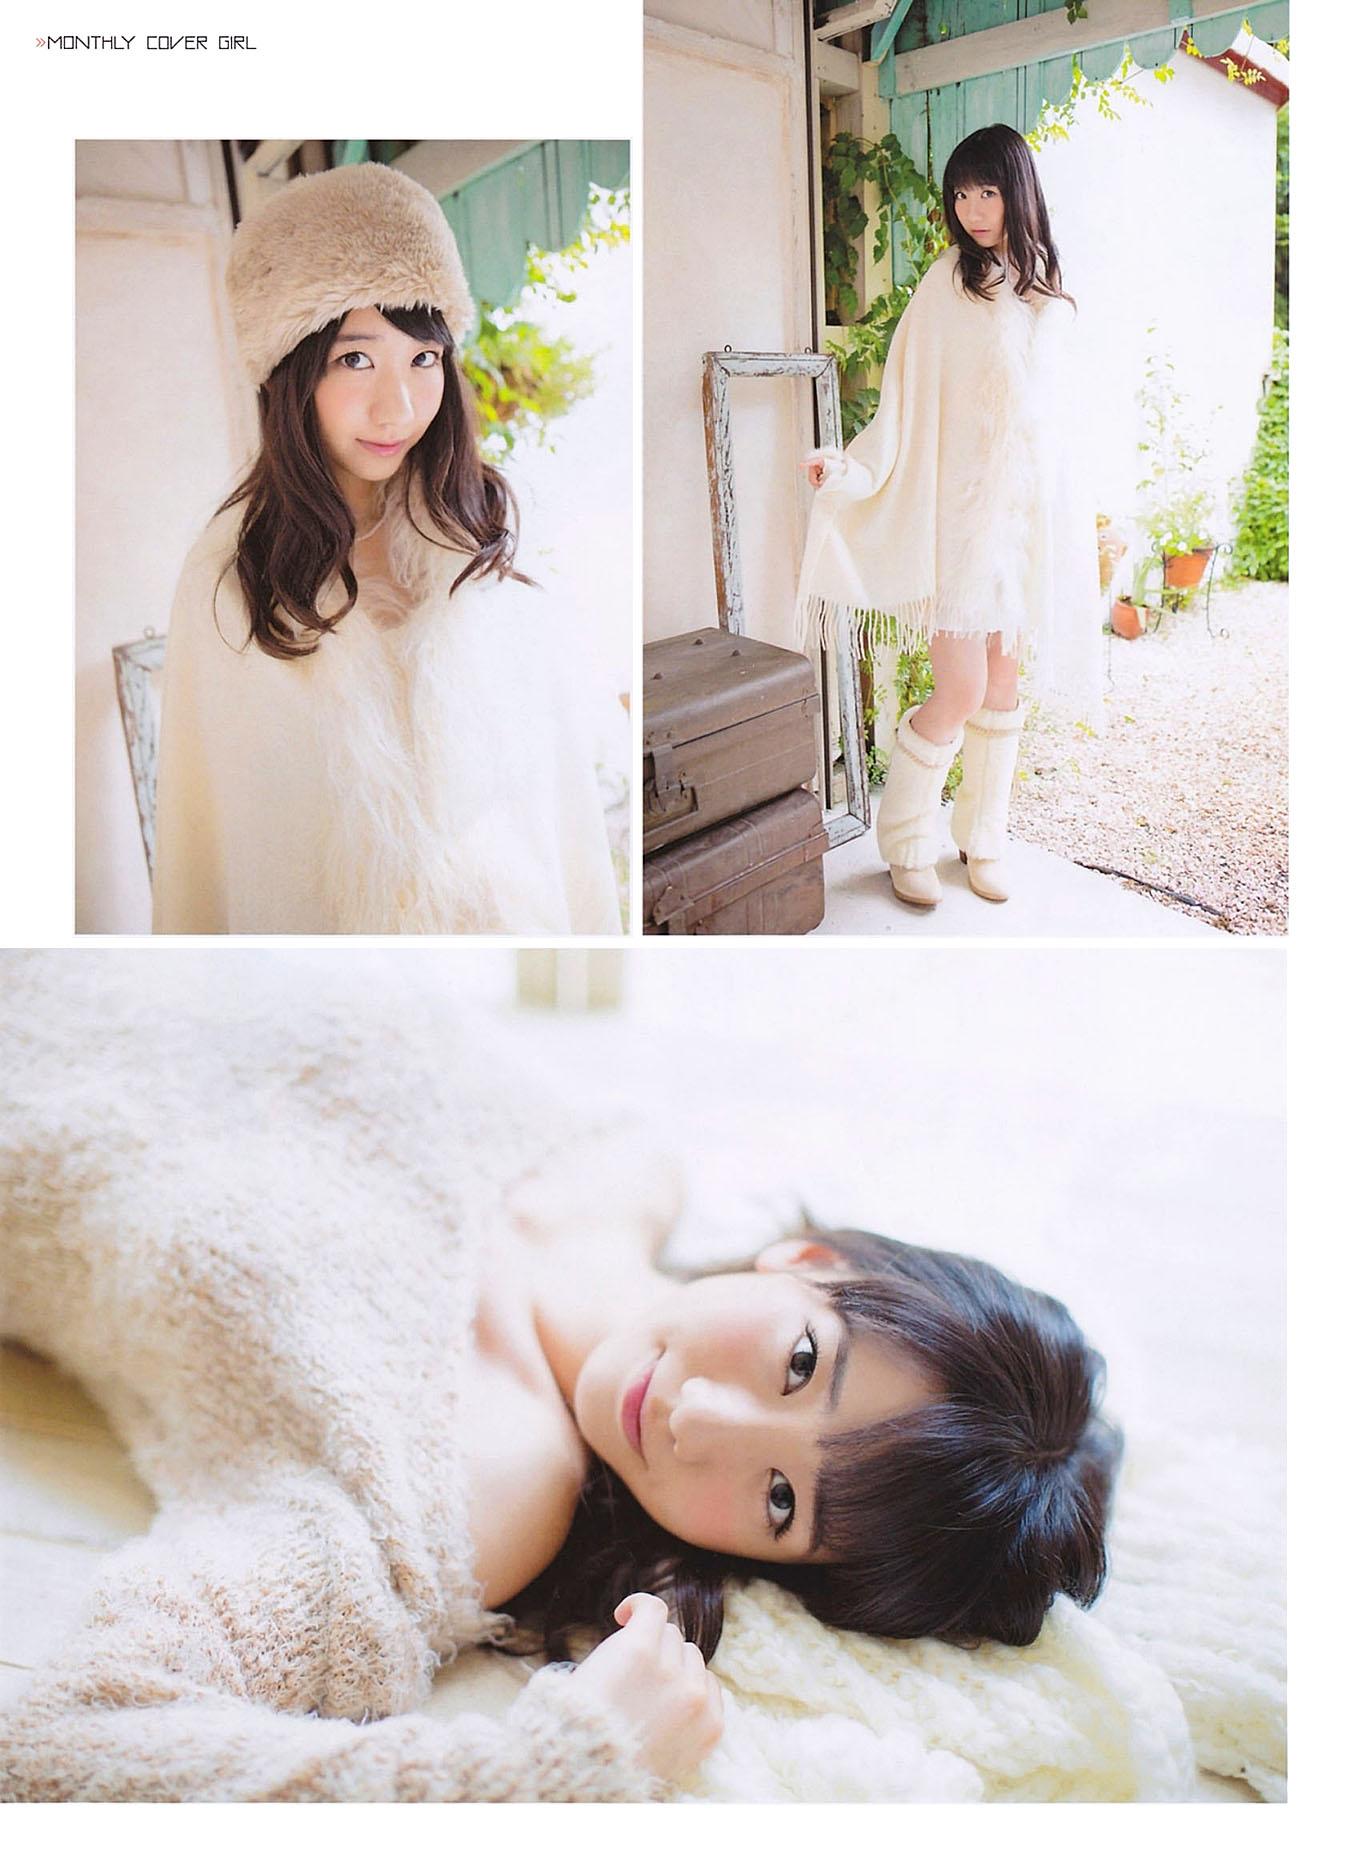 YKashiwagi EnTame 1302 04.jpg